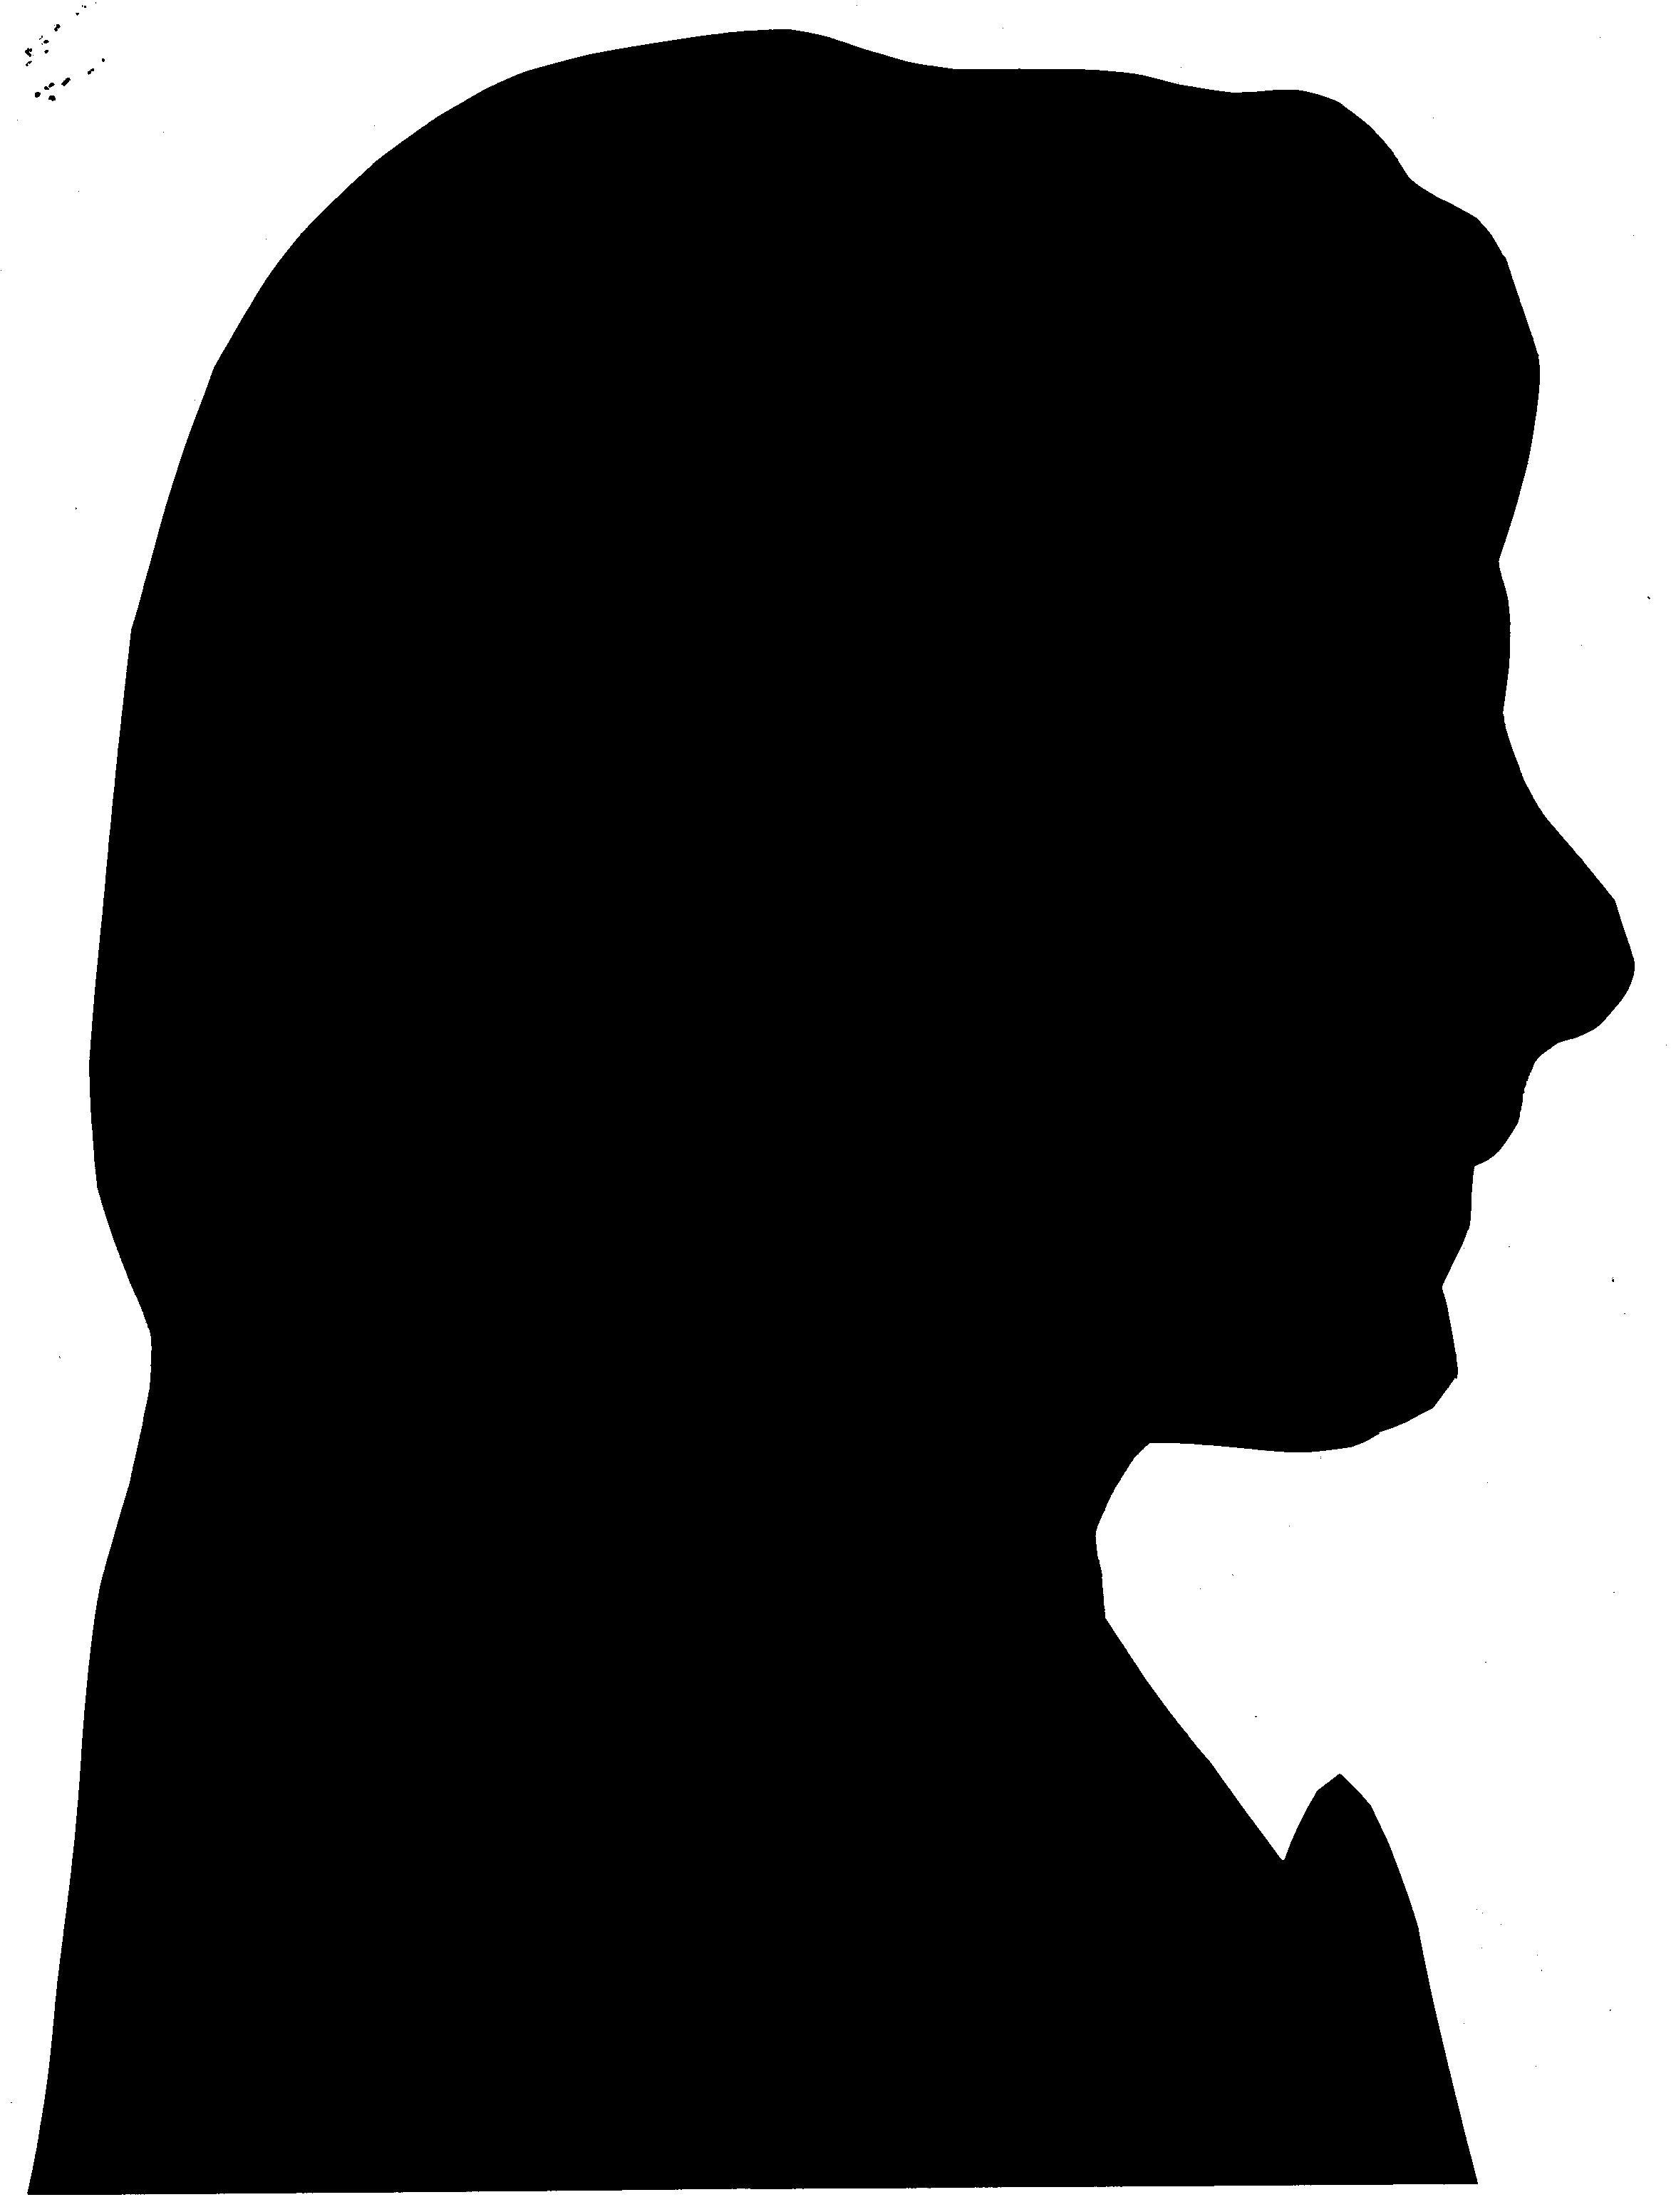 Beatrice's Silhouette